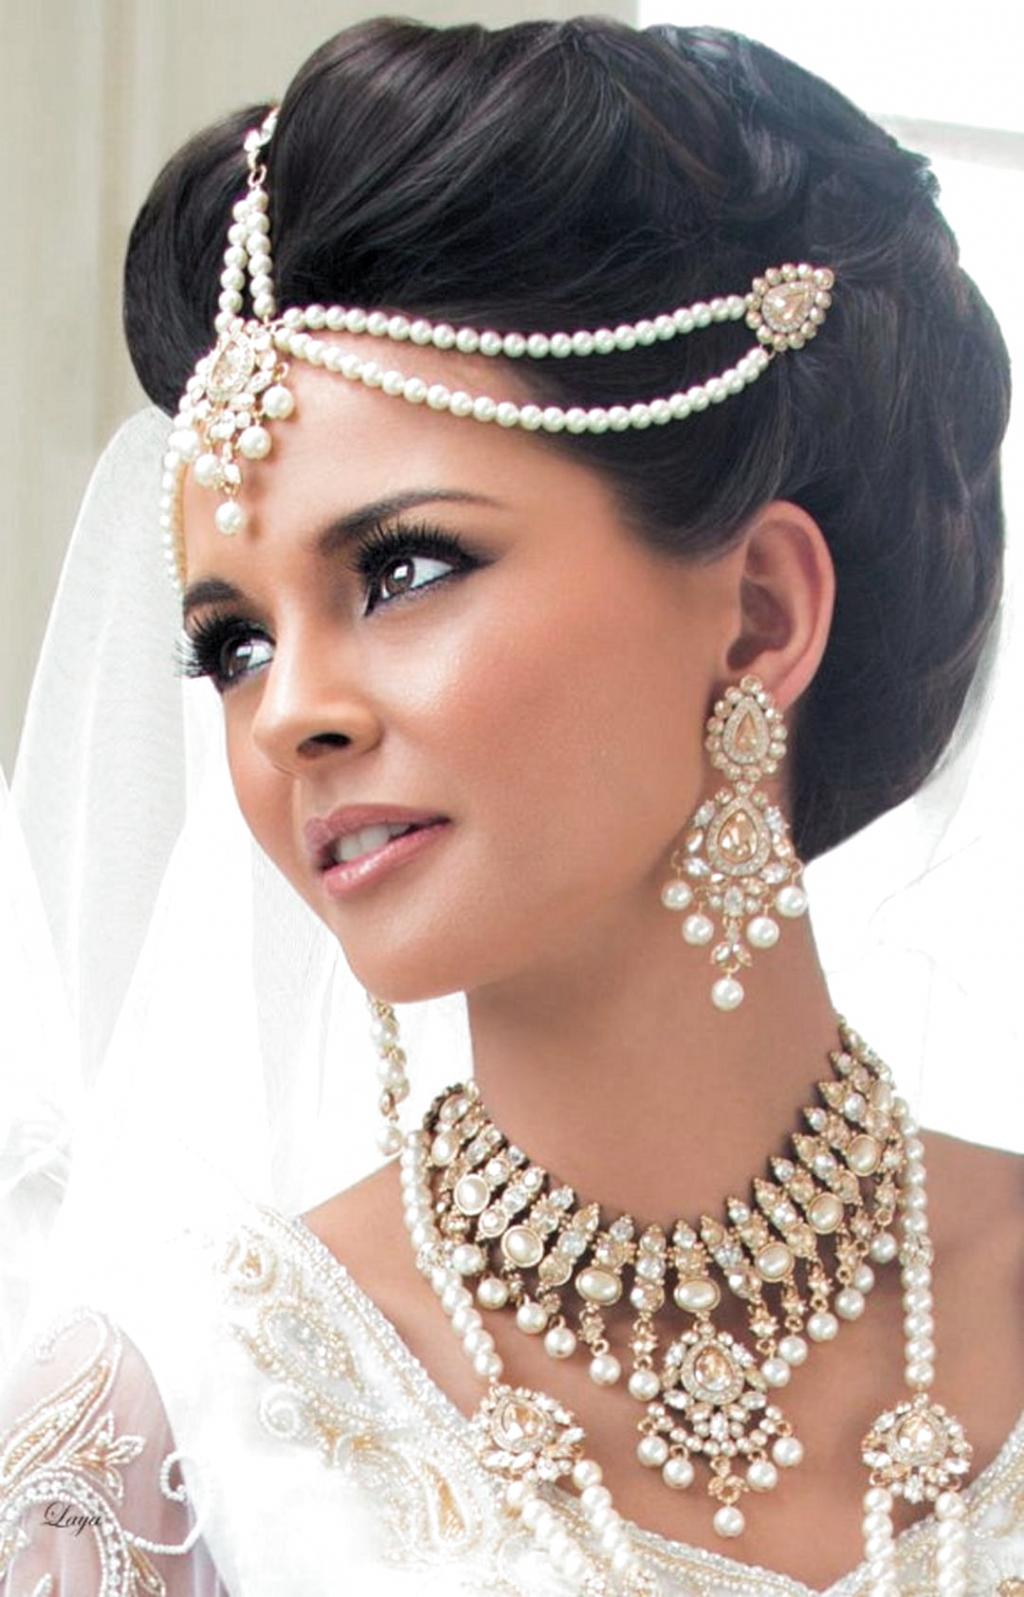 38+ Haute coiffure pour mariage indienne inspiration